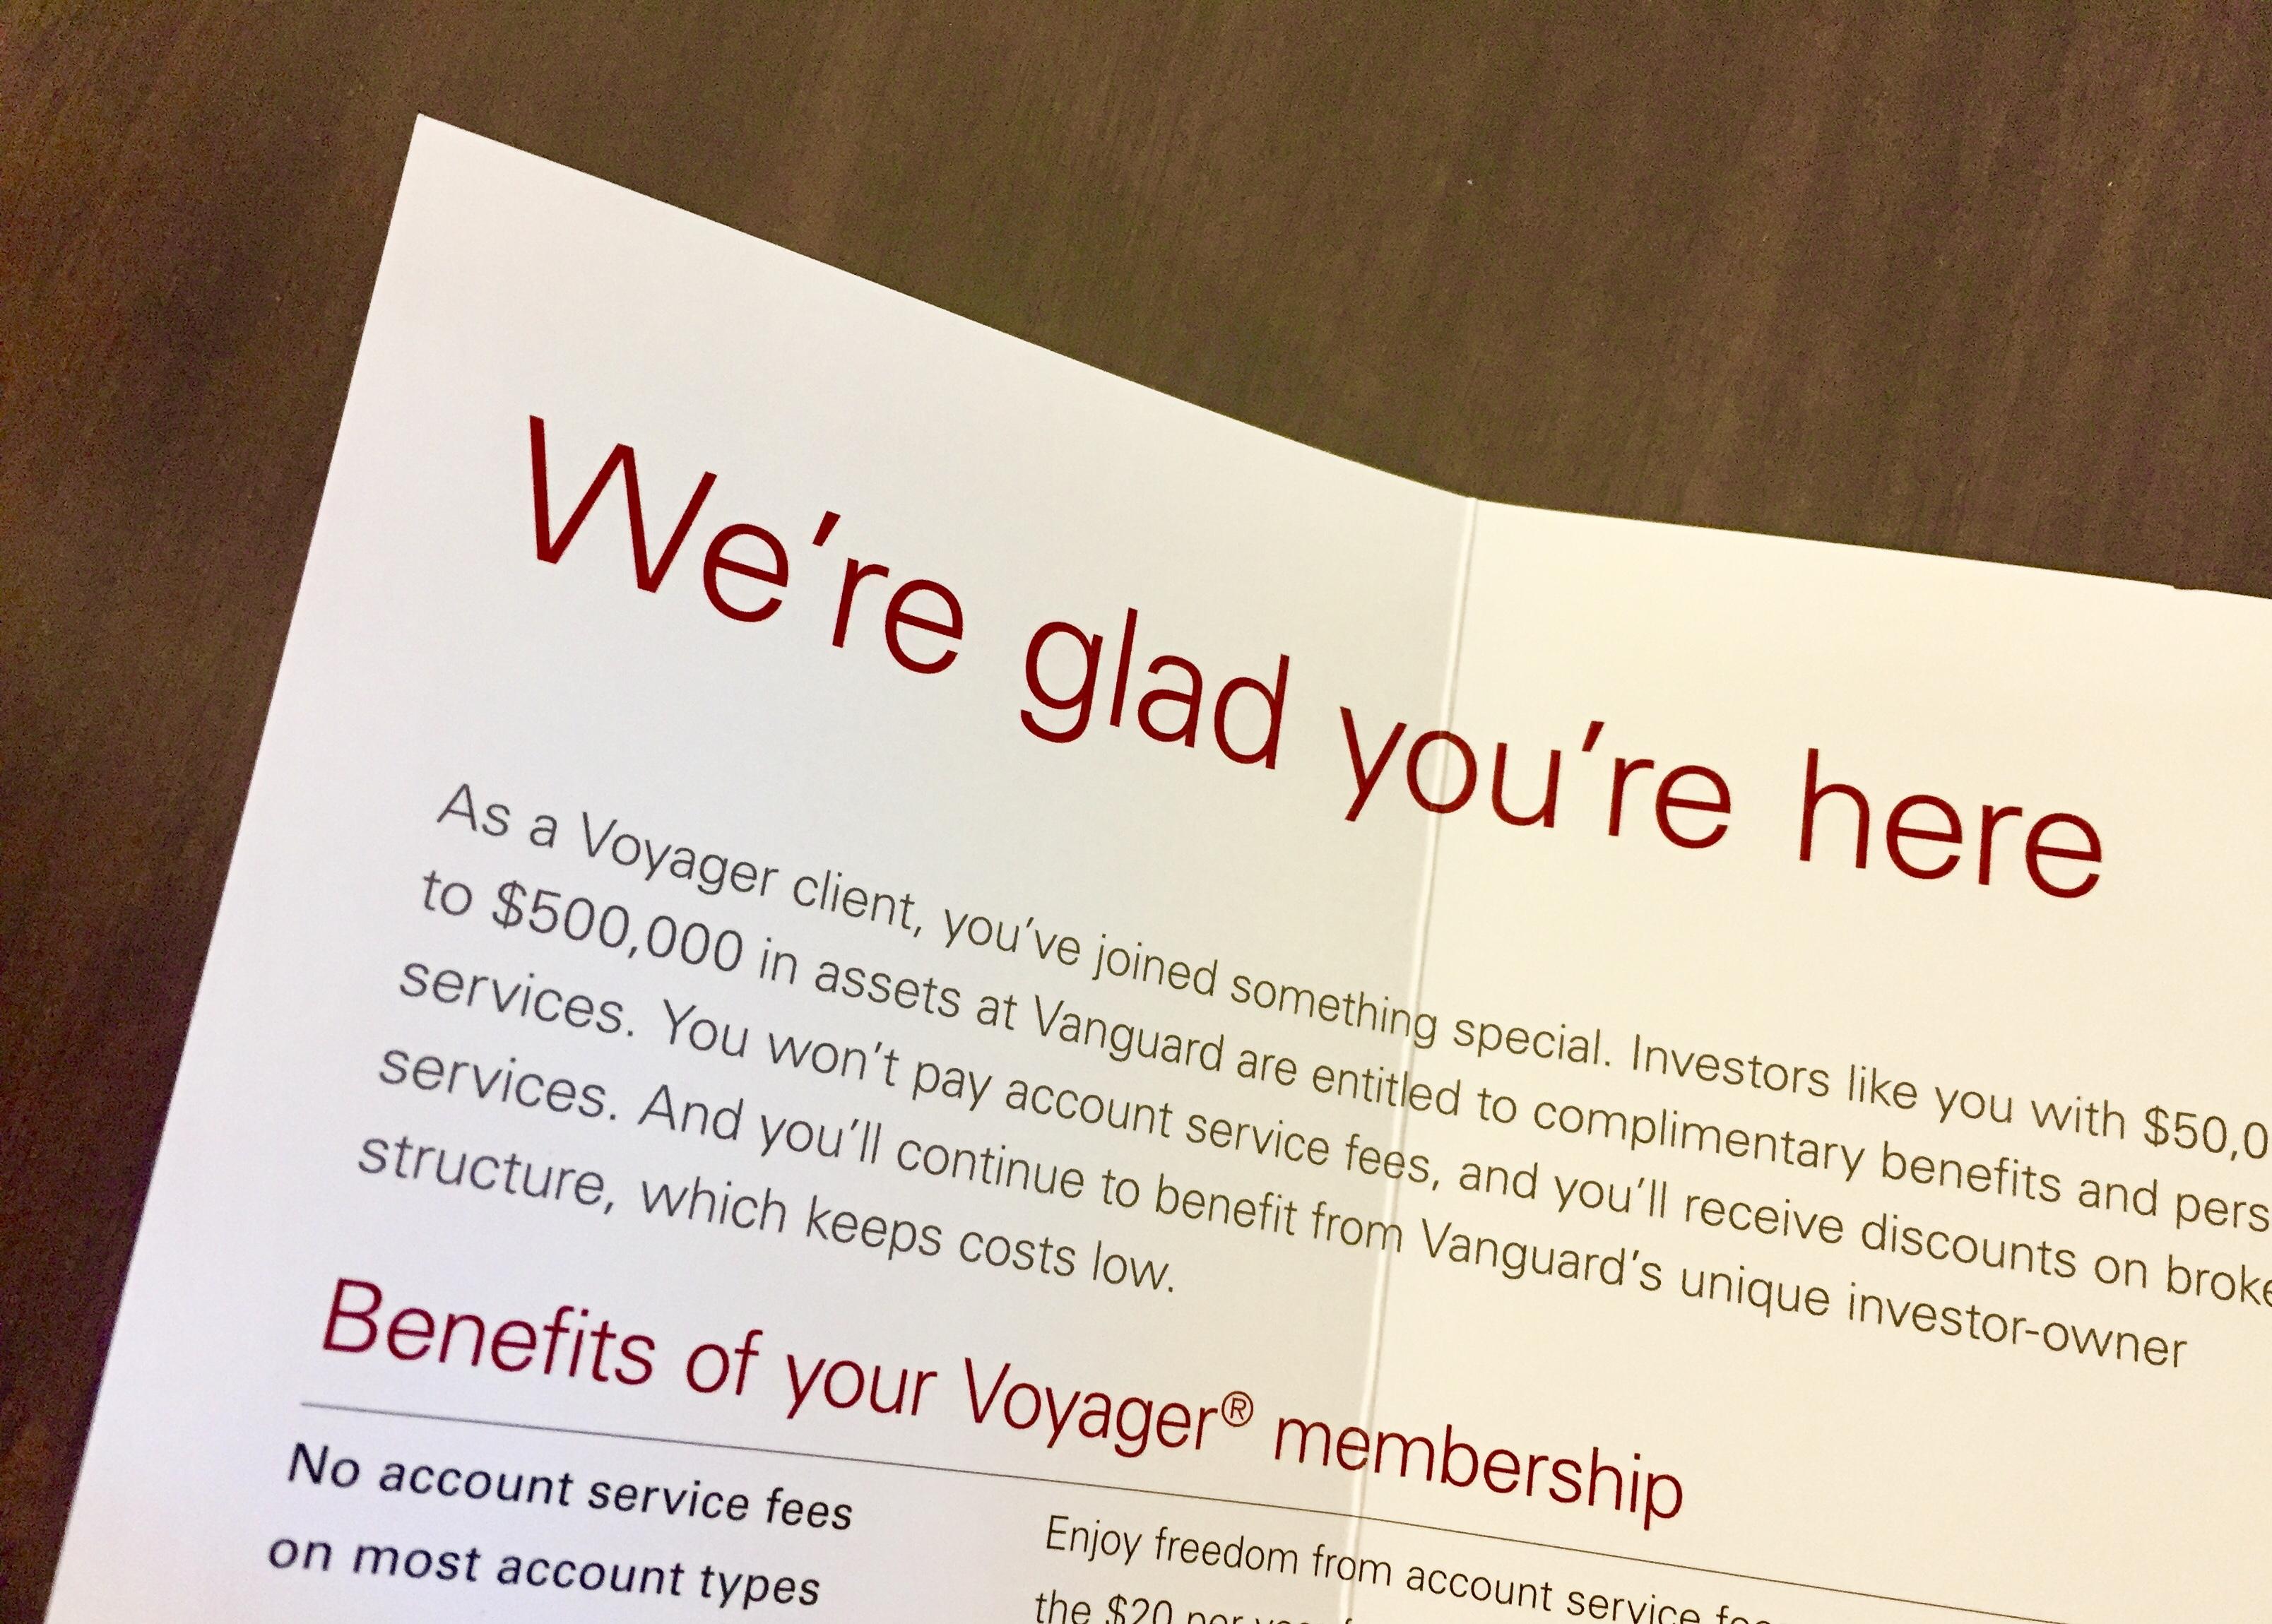 Vanguard voyager services